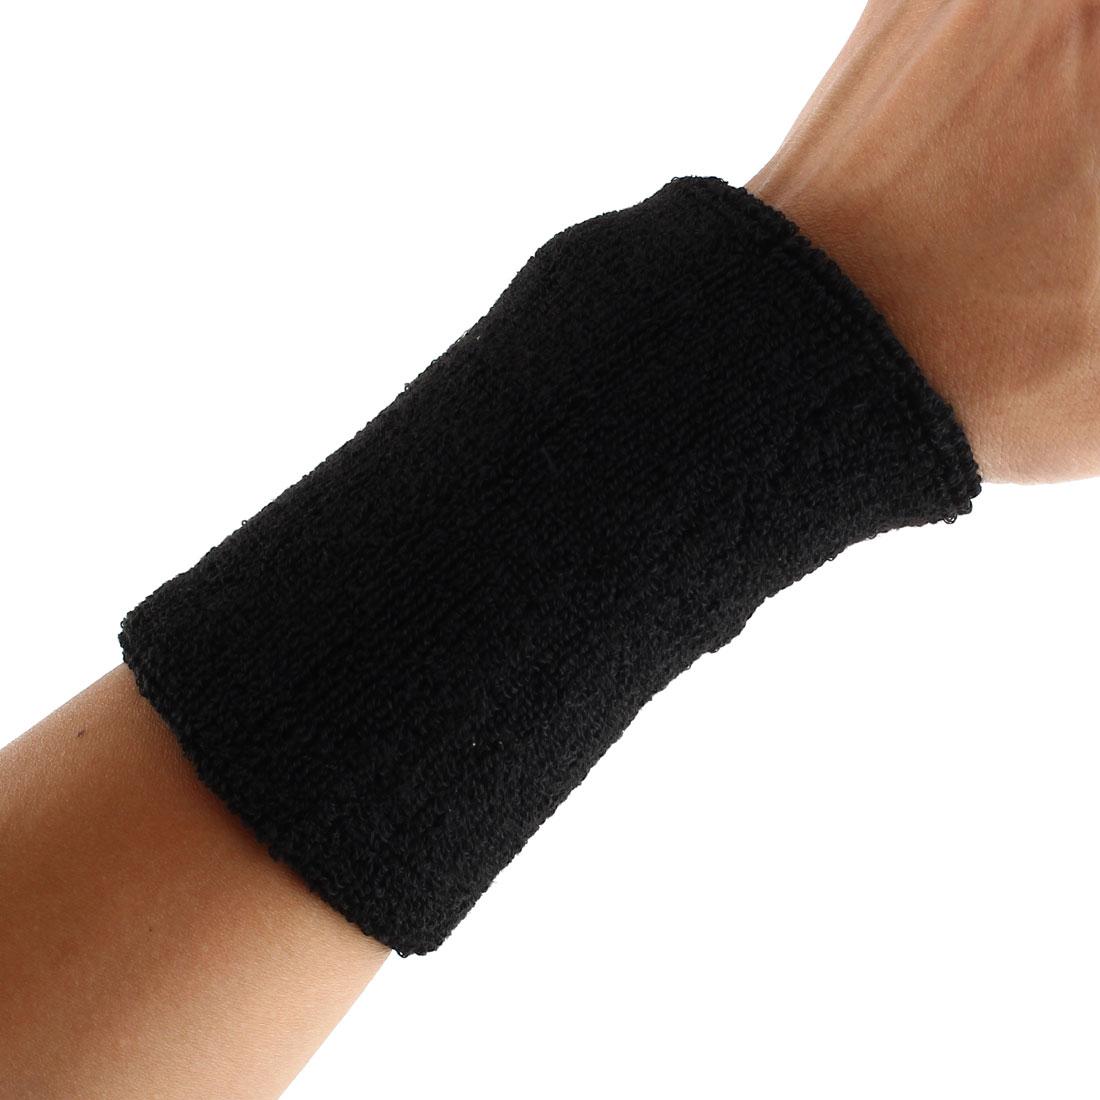 Exercises Football Gym Elastic Strap Hand Protector Sweatband Sport Wrist Black 2pcs